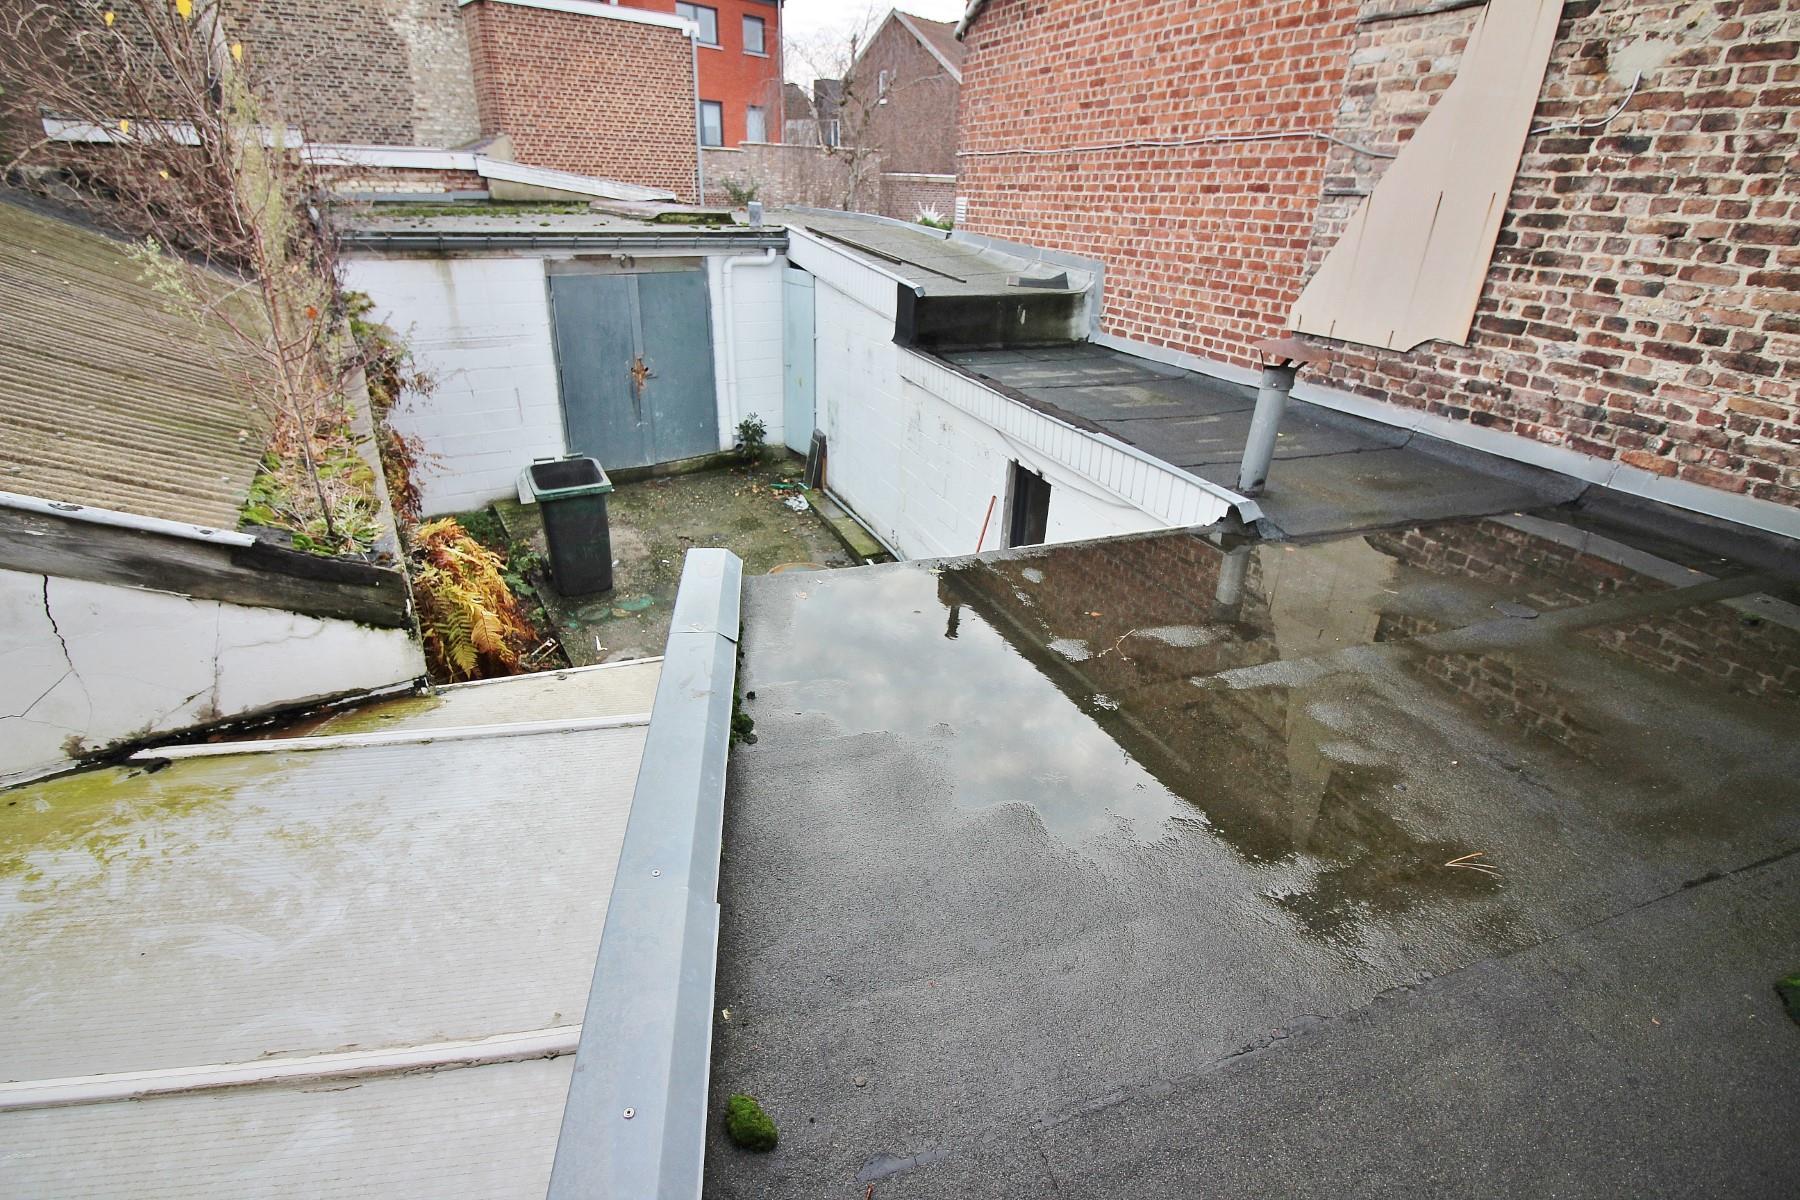 Maison - Beyne-Heusay Bellaire - #3946189-22